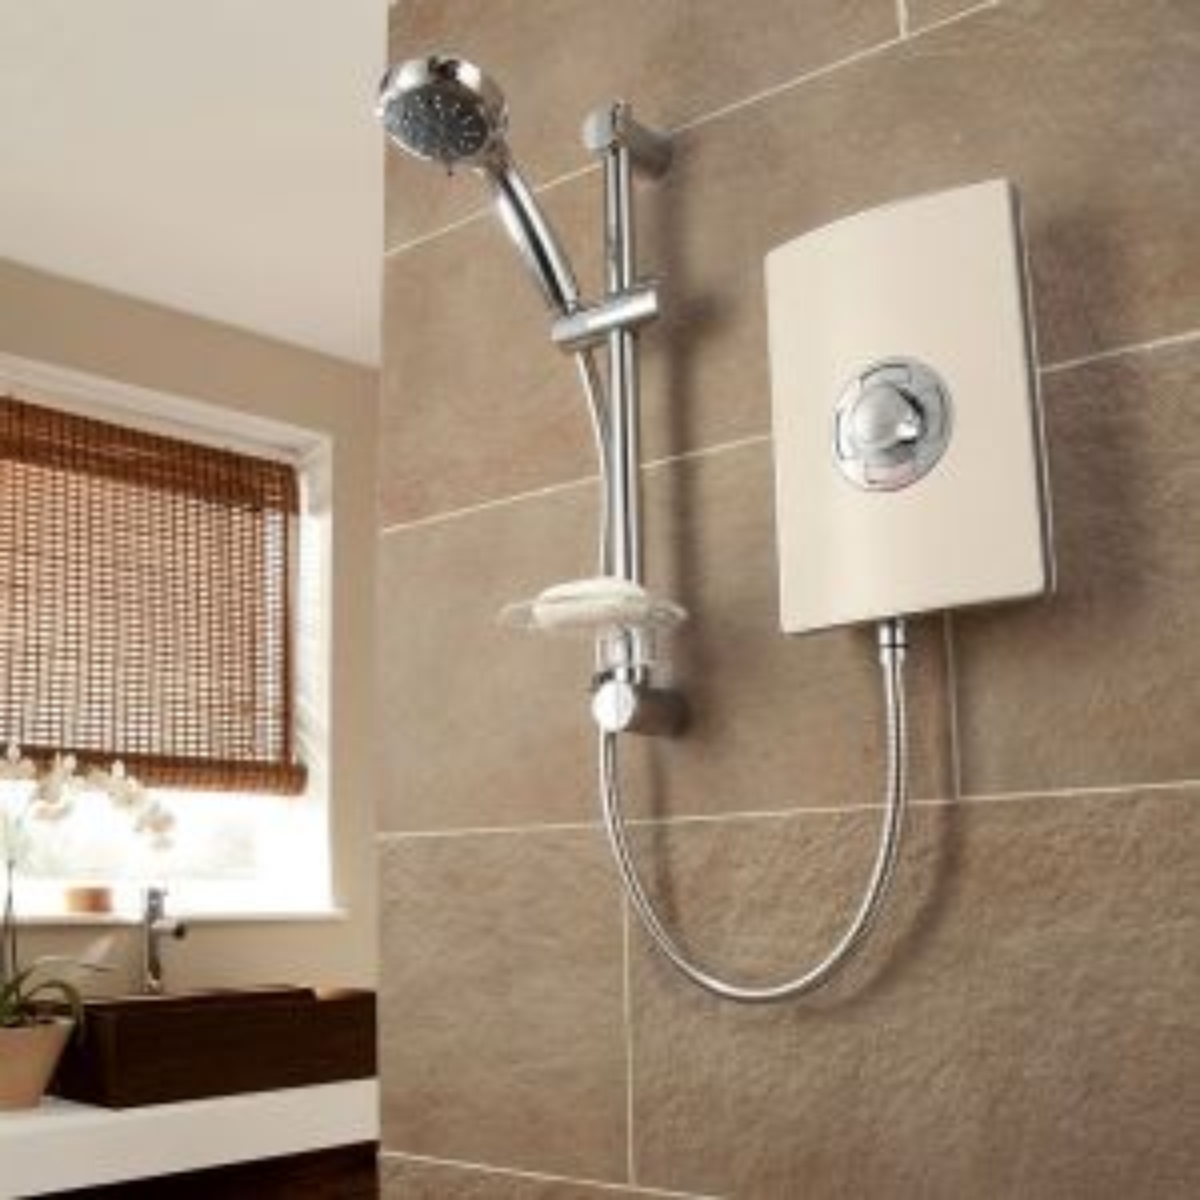 Triton Aspirante Riviera Sand Electric Shower in Situation